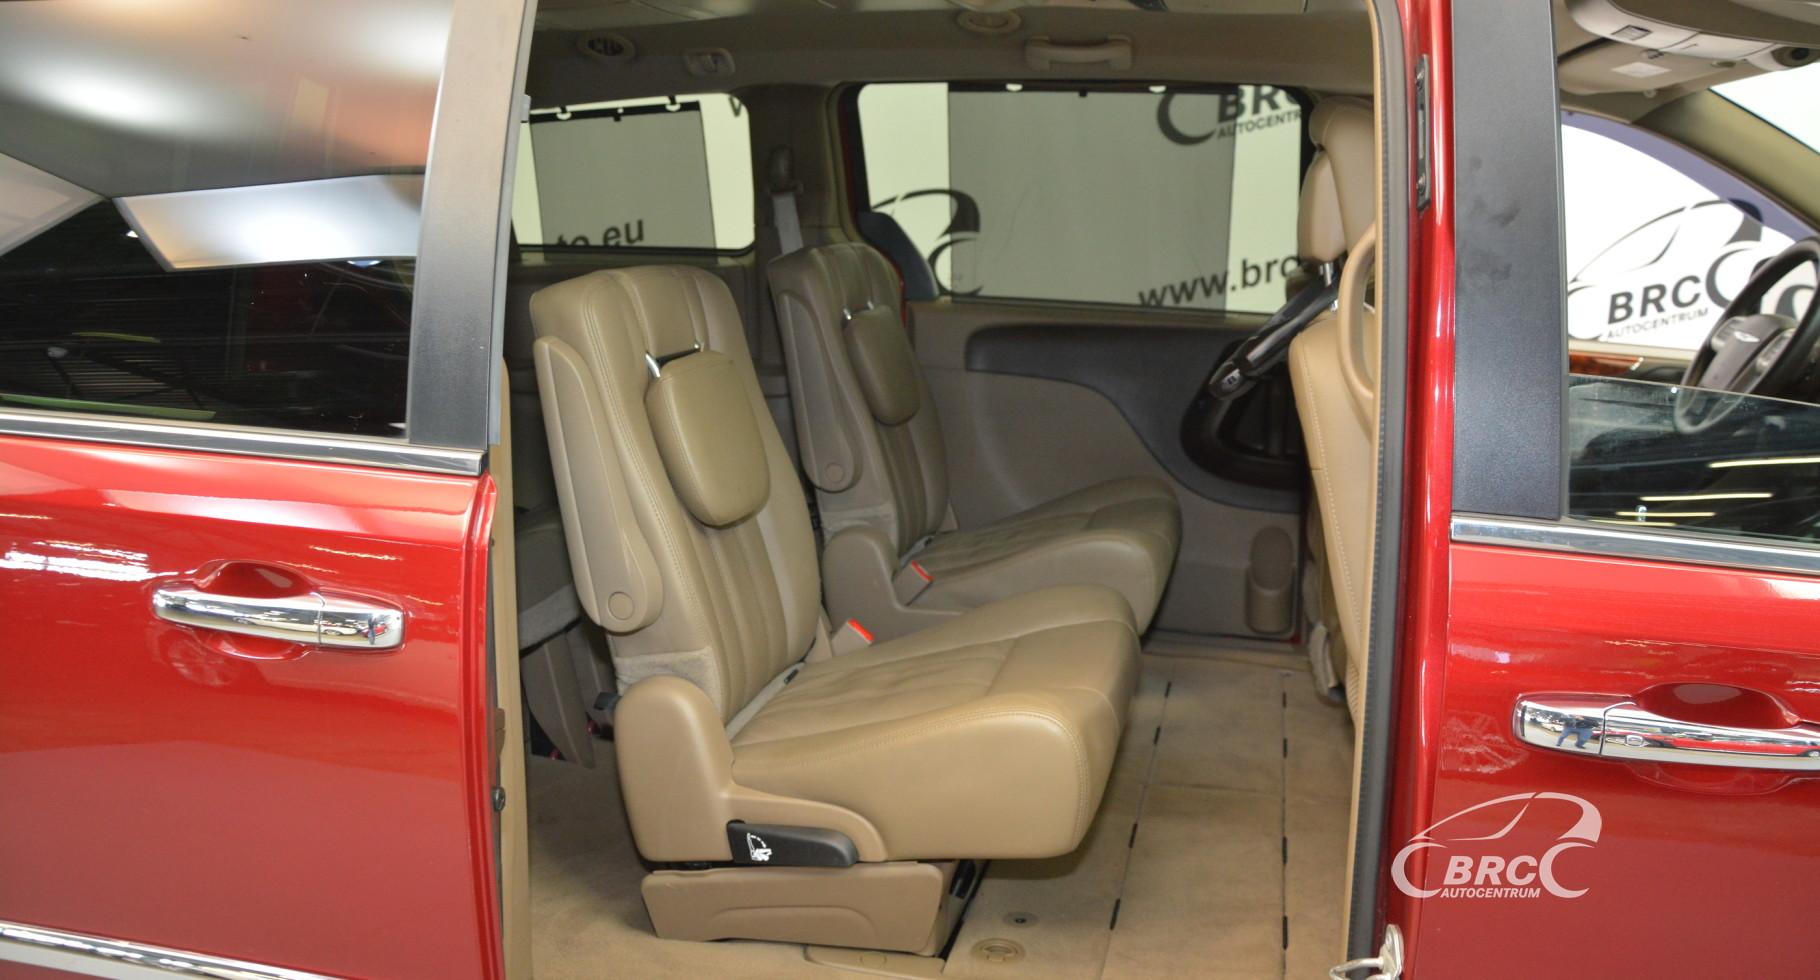 Chrysler Town Country 3.6 V6 Touring-L